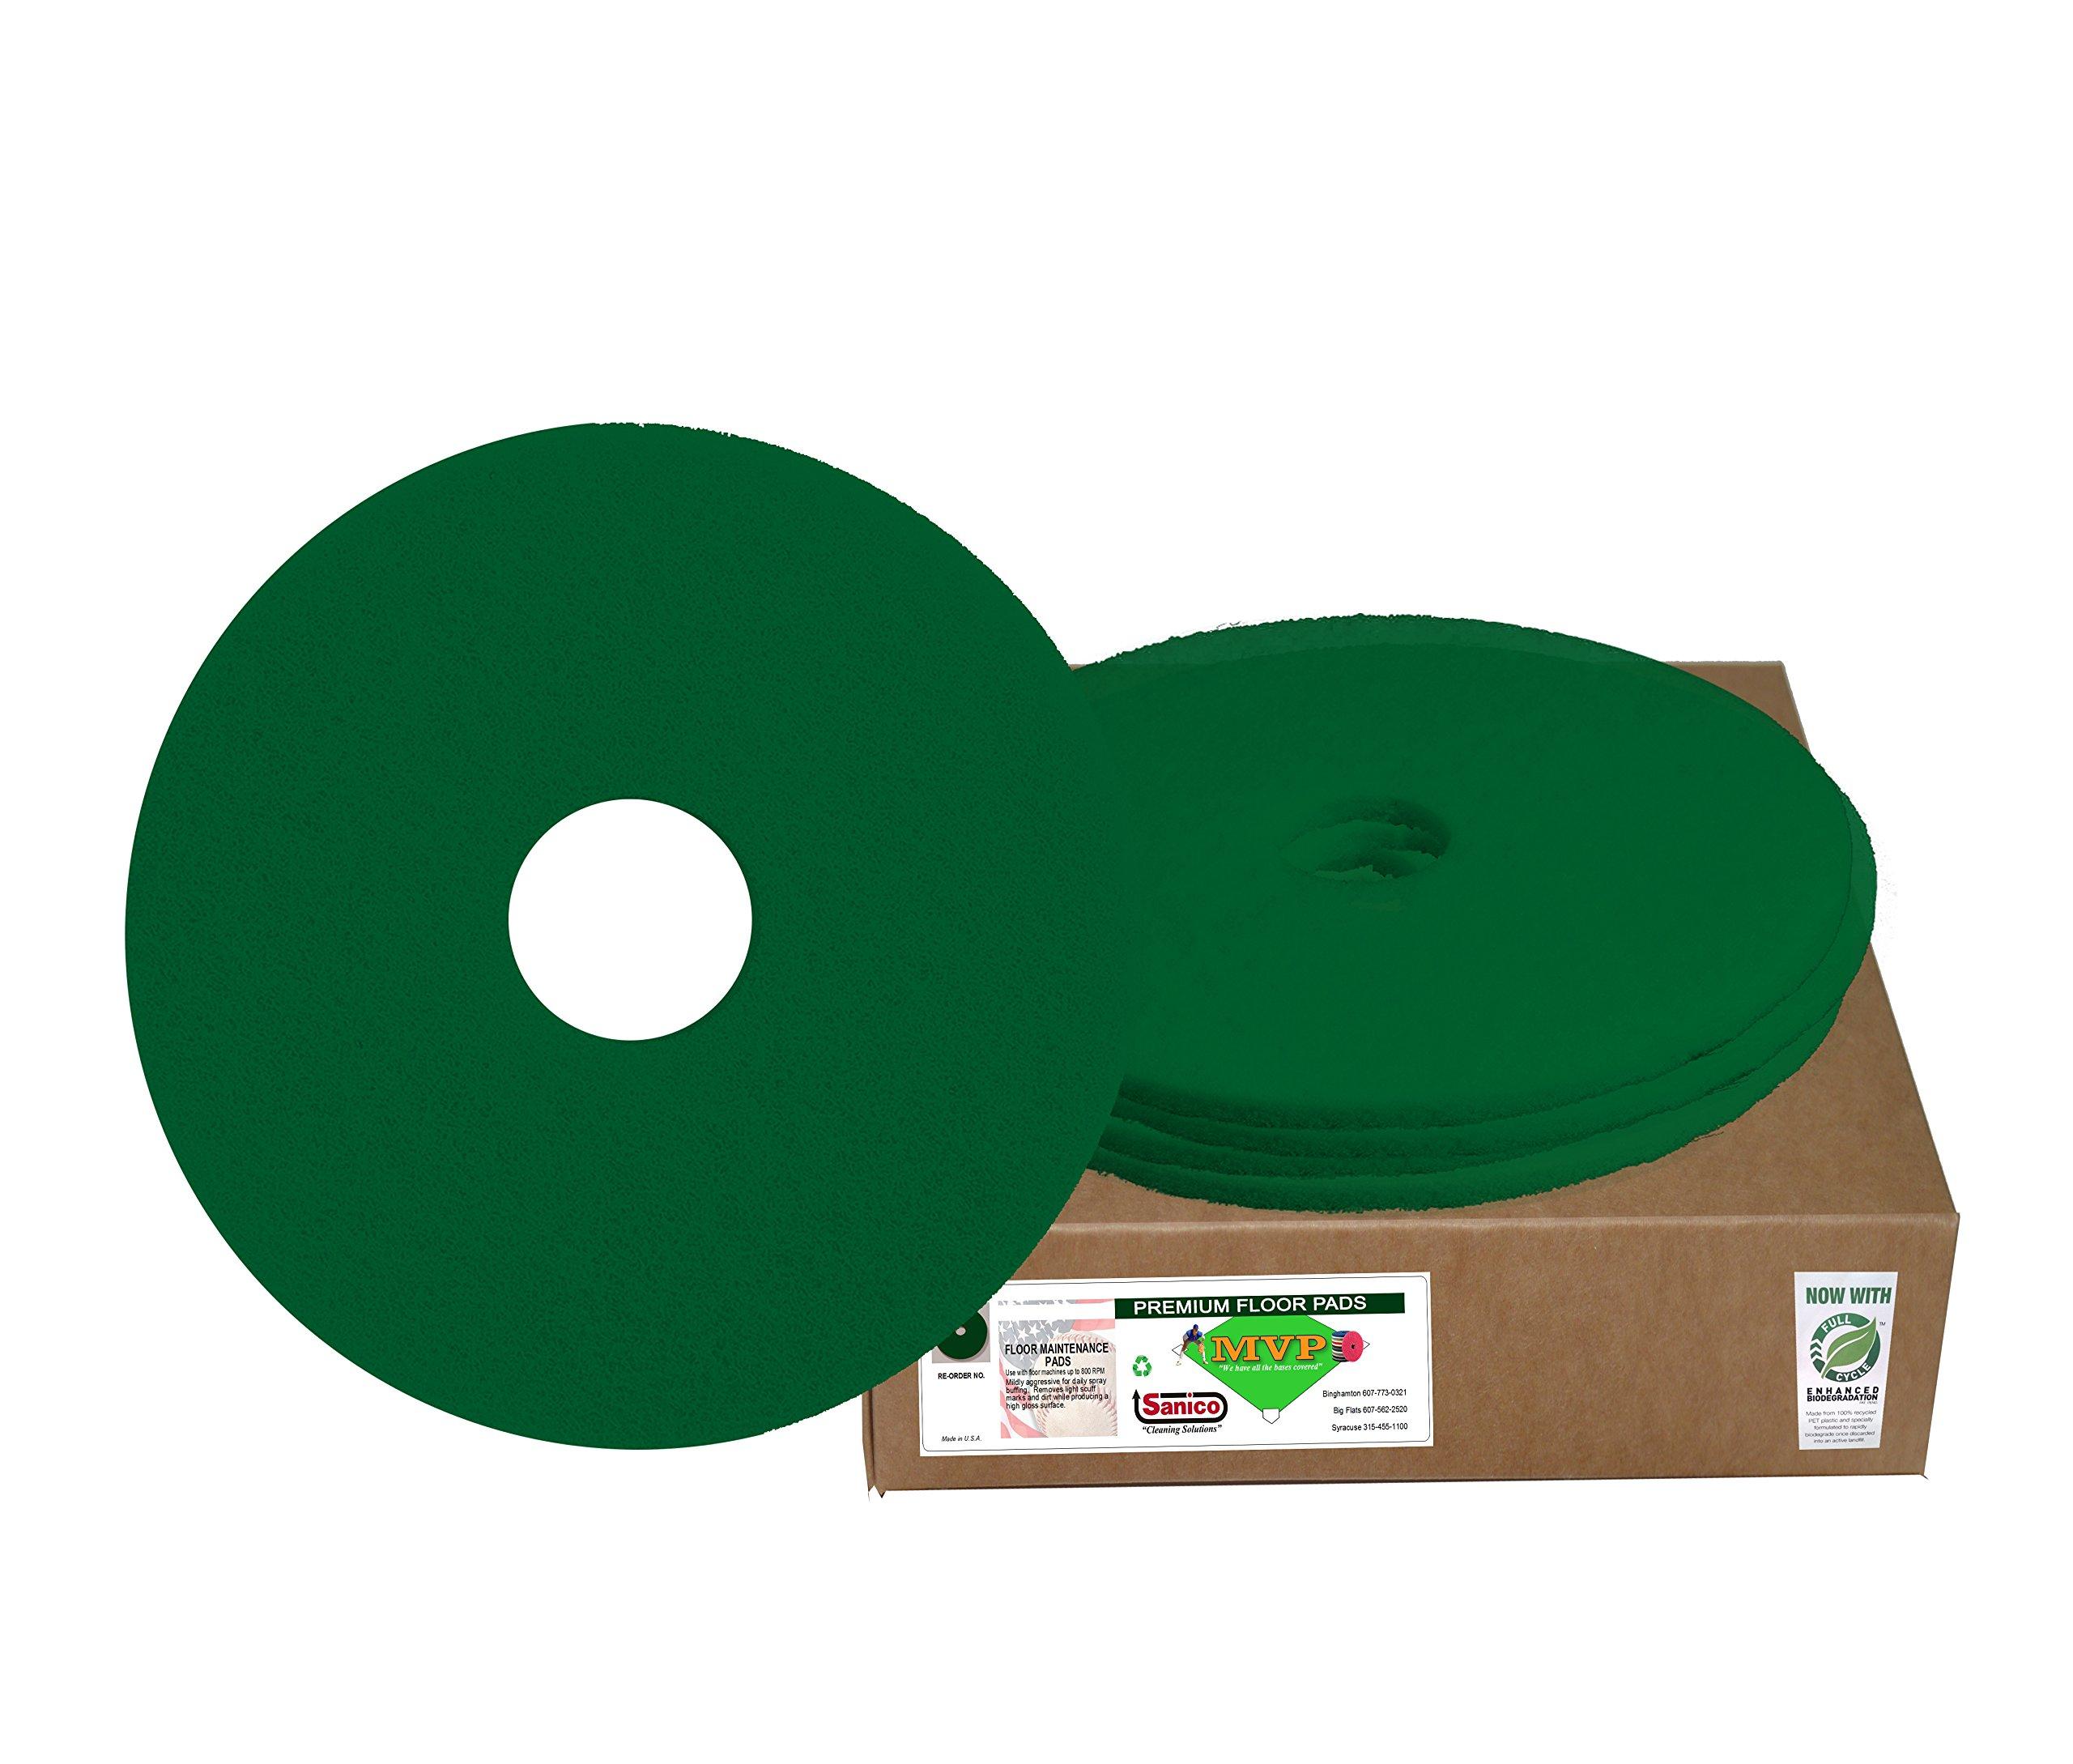 Sanico MVP Green Monster 20'' Green Scrubbing Floor Pad Deep Cleaning (5 per case) -(1 CASE)